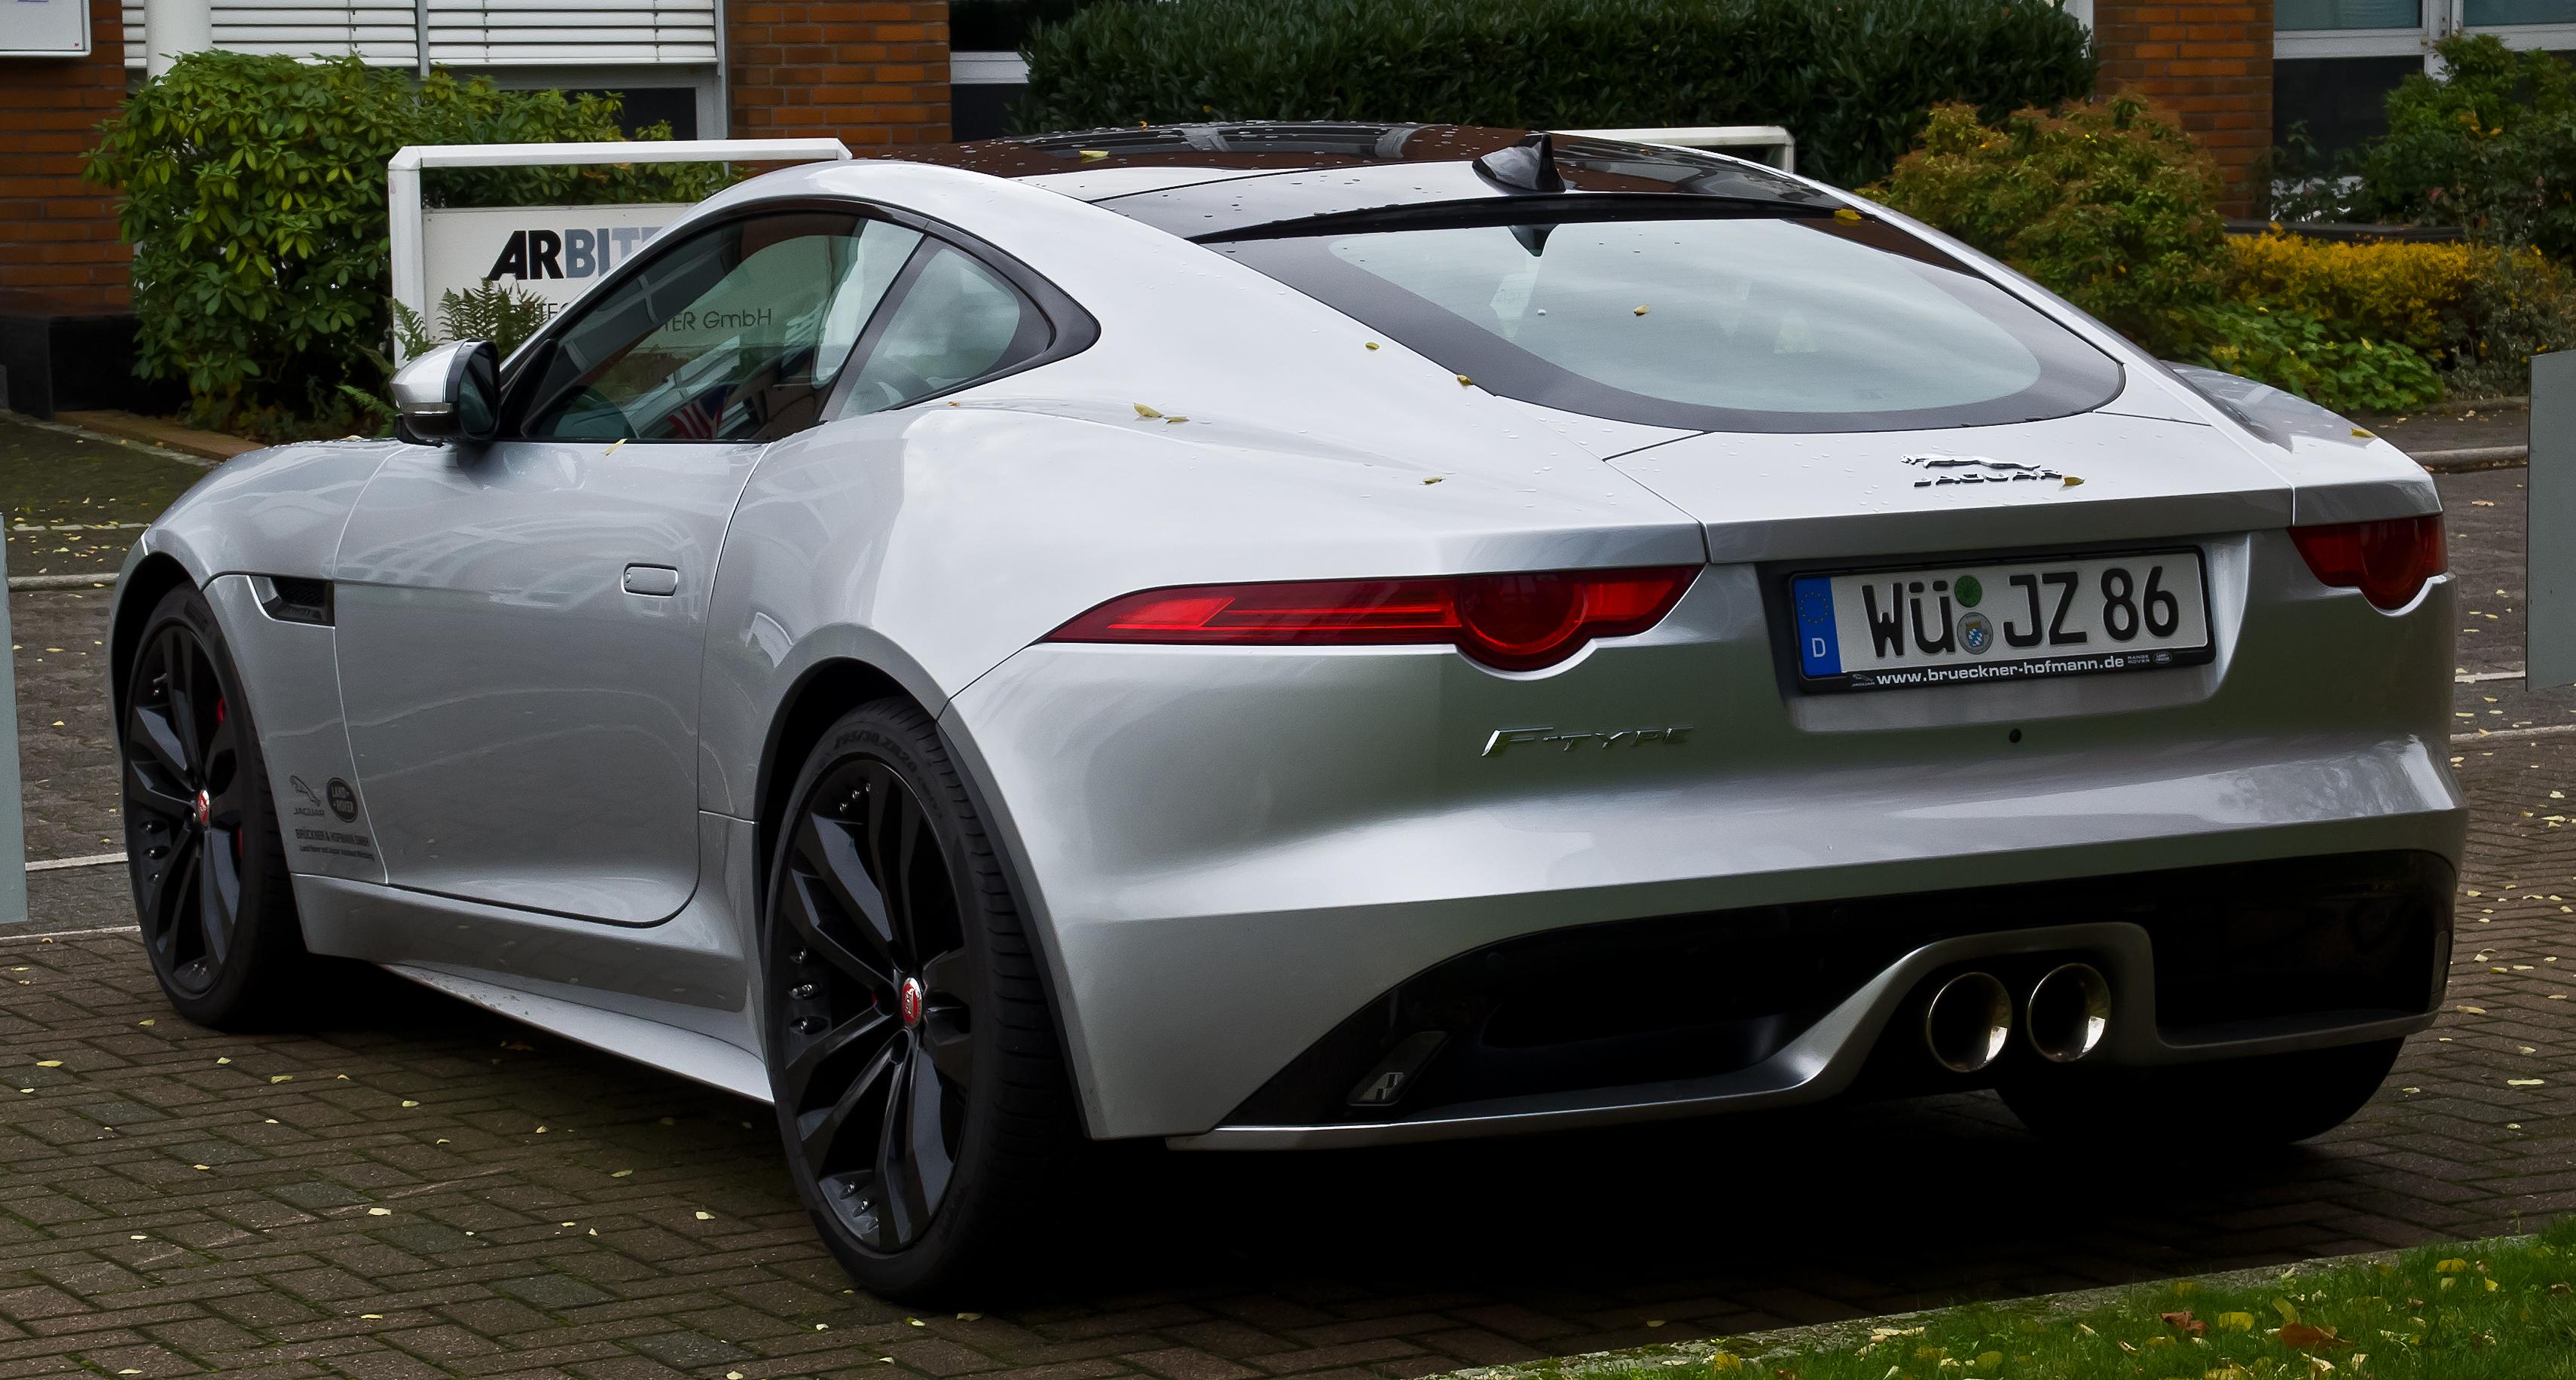 compare sale jaguar vs cars news h for type mazda cx f pace